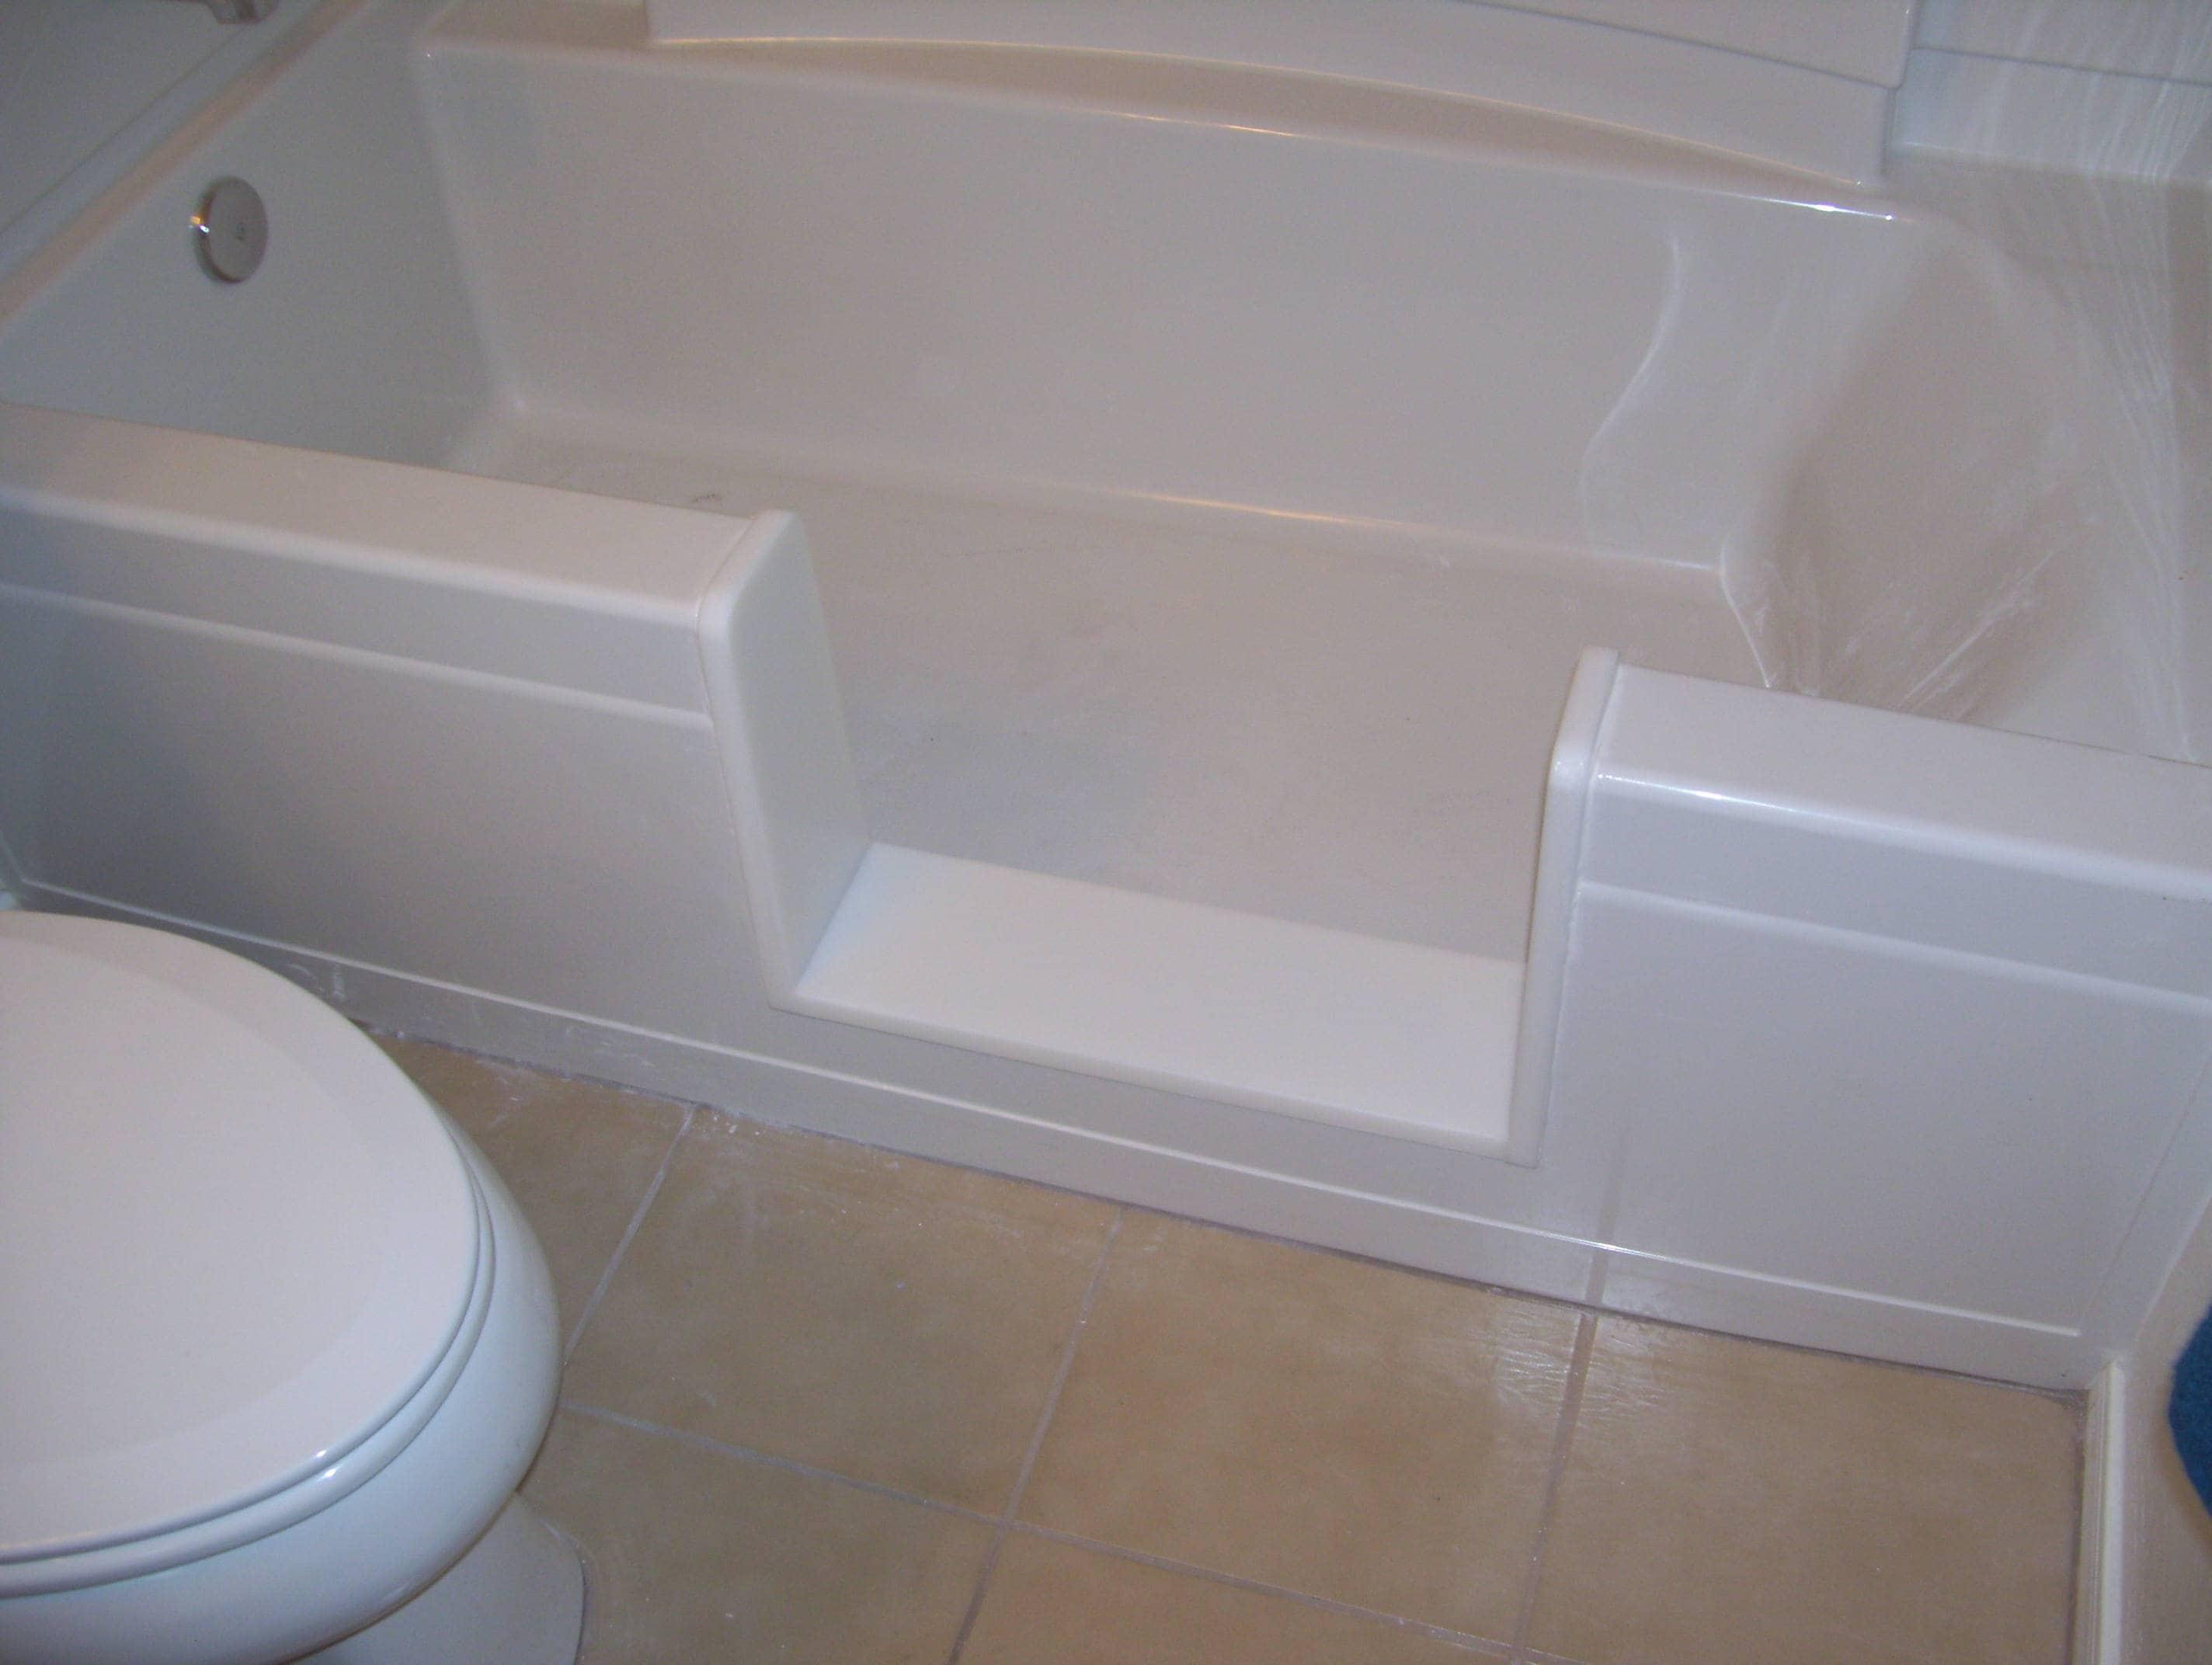 Custom Standard Bathtub To Walk In Shower Conversion Kit